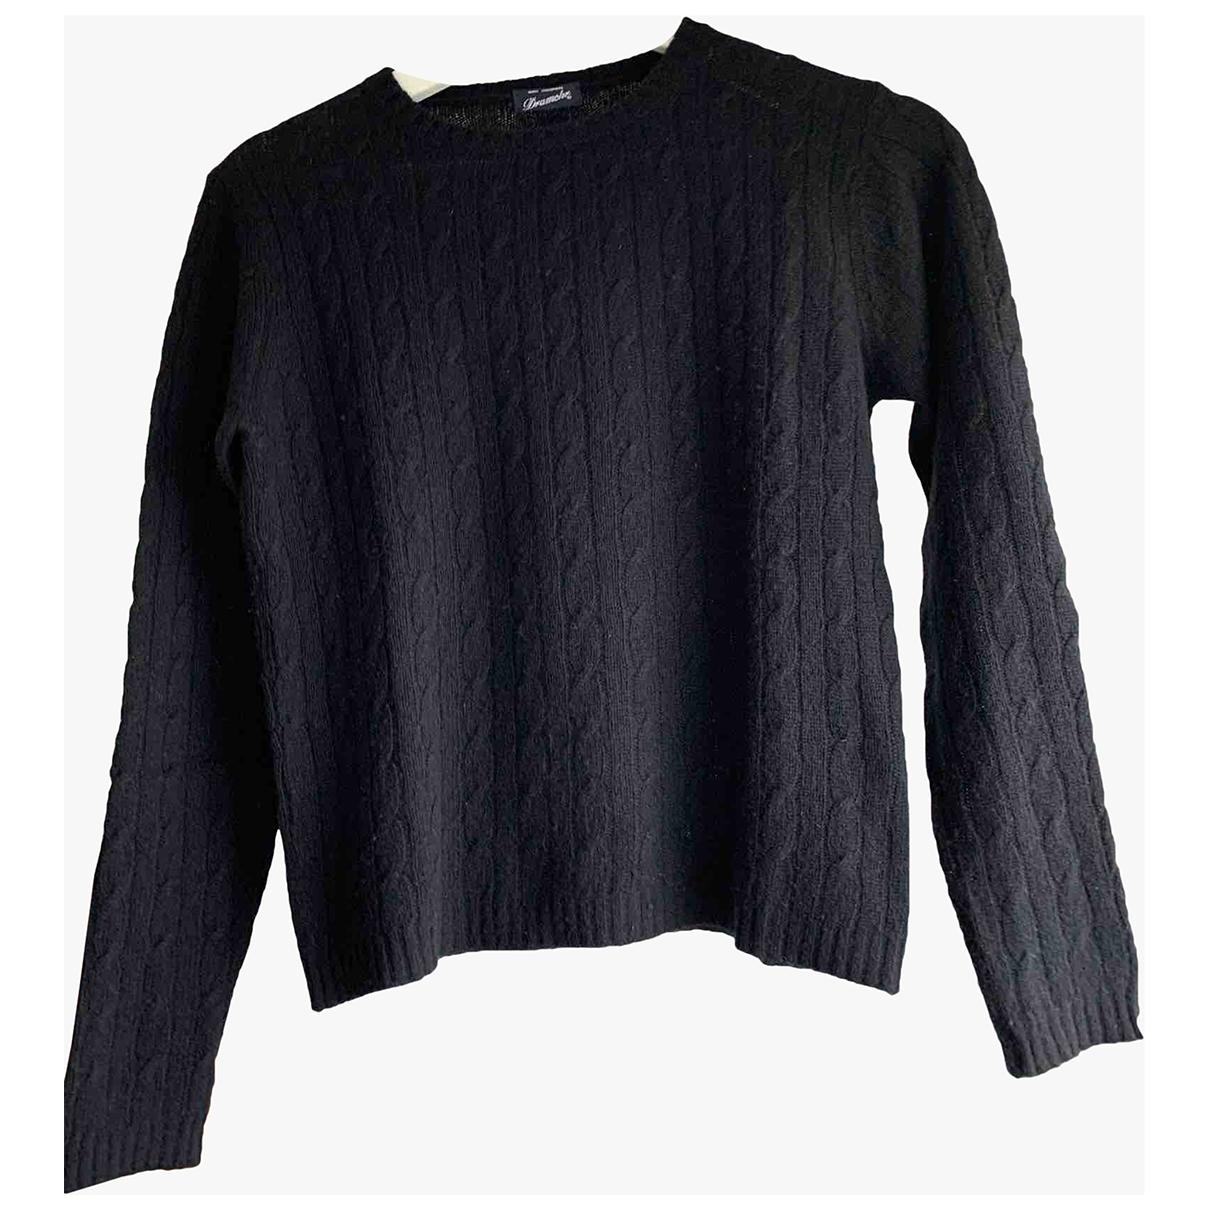 Drumohr \N Black Cashmere Knitwear for Women XS International